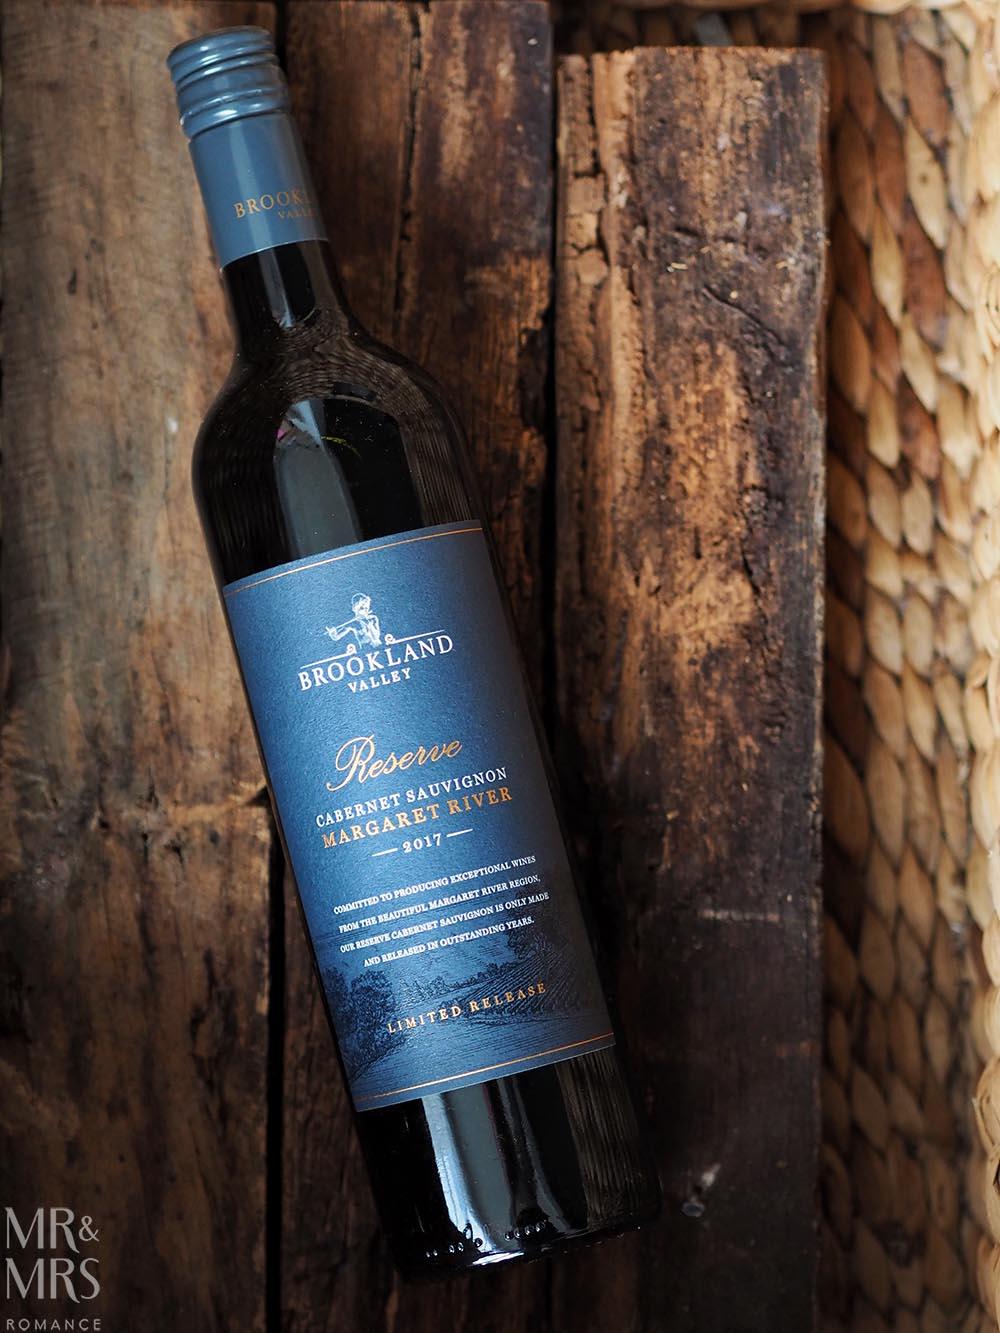 Wine tasting - Brookland Valley Reserve Cab Sauv